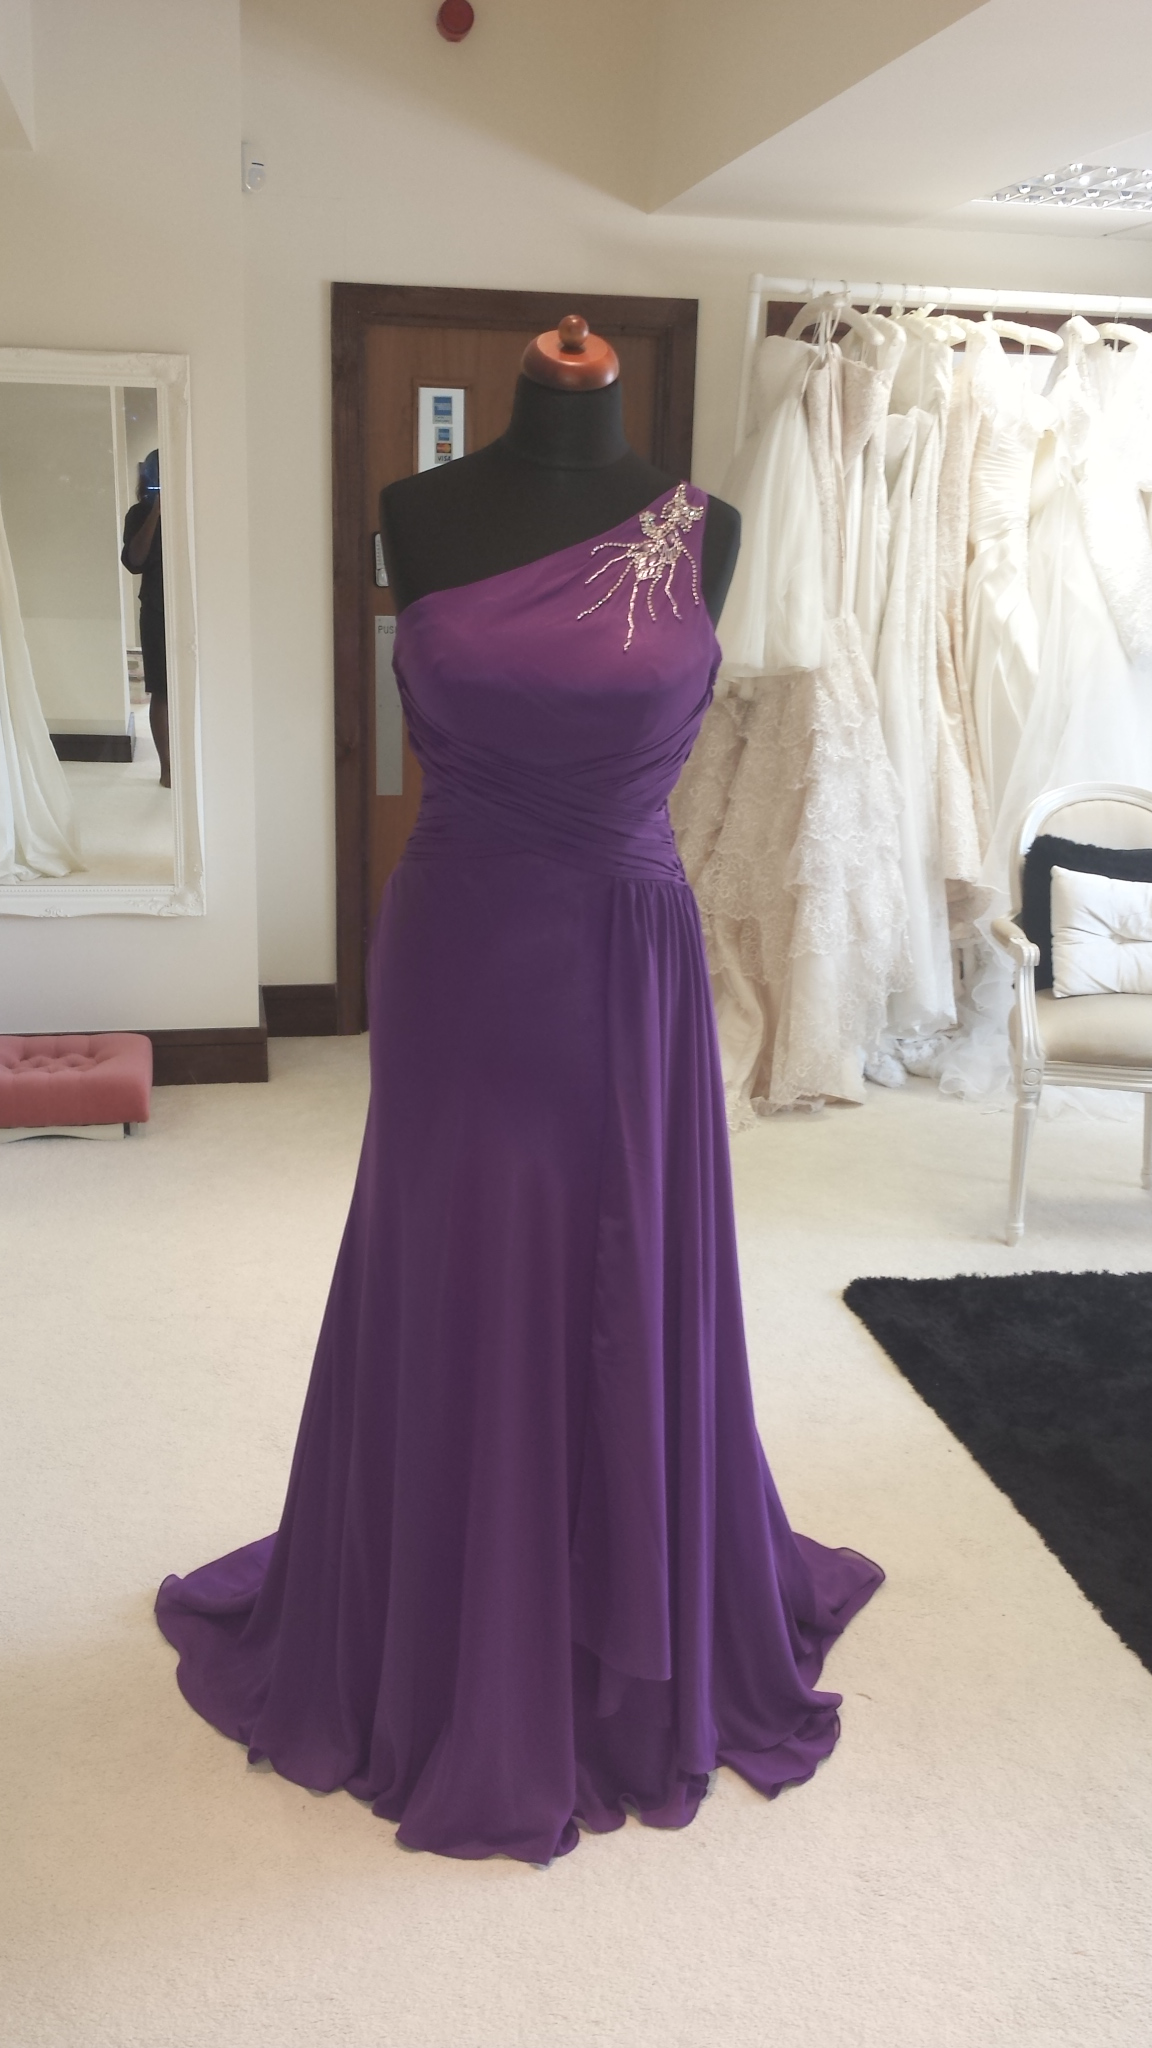 Stunning purple one shoulder prom dress milton keynes